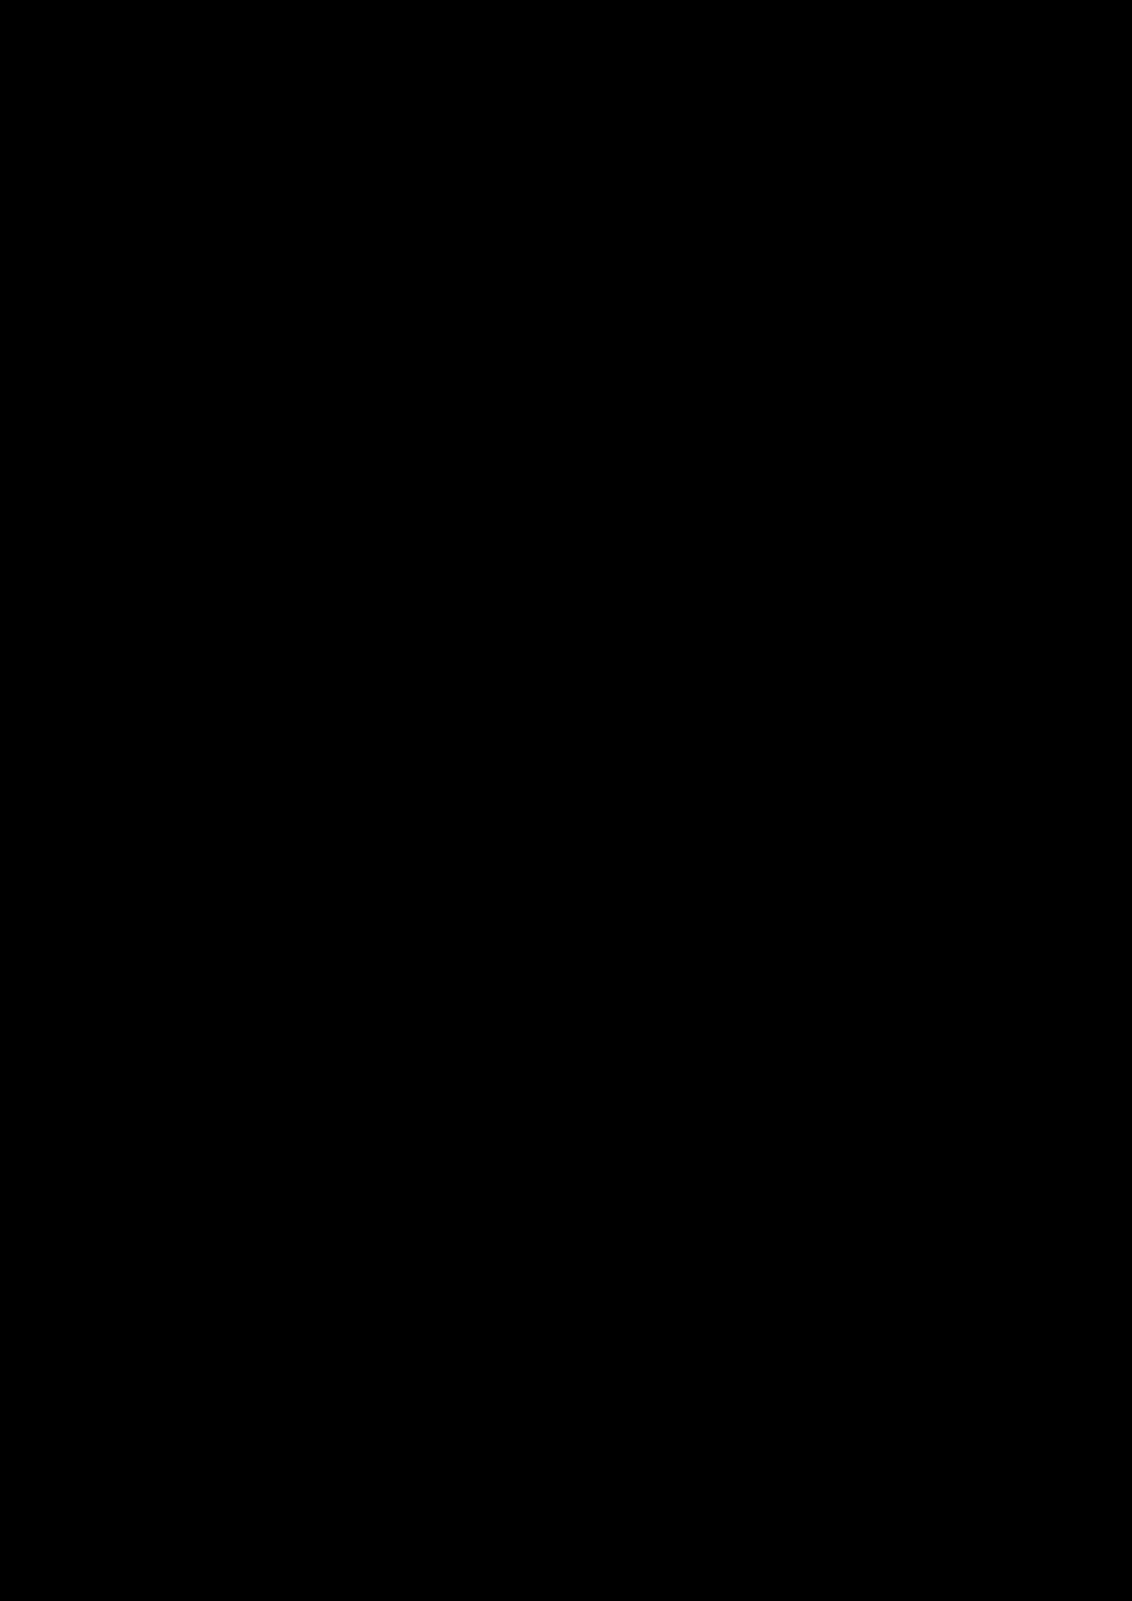 Ispoved Pervogo Boga slide, Image 1